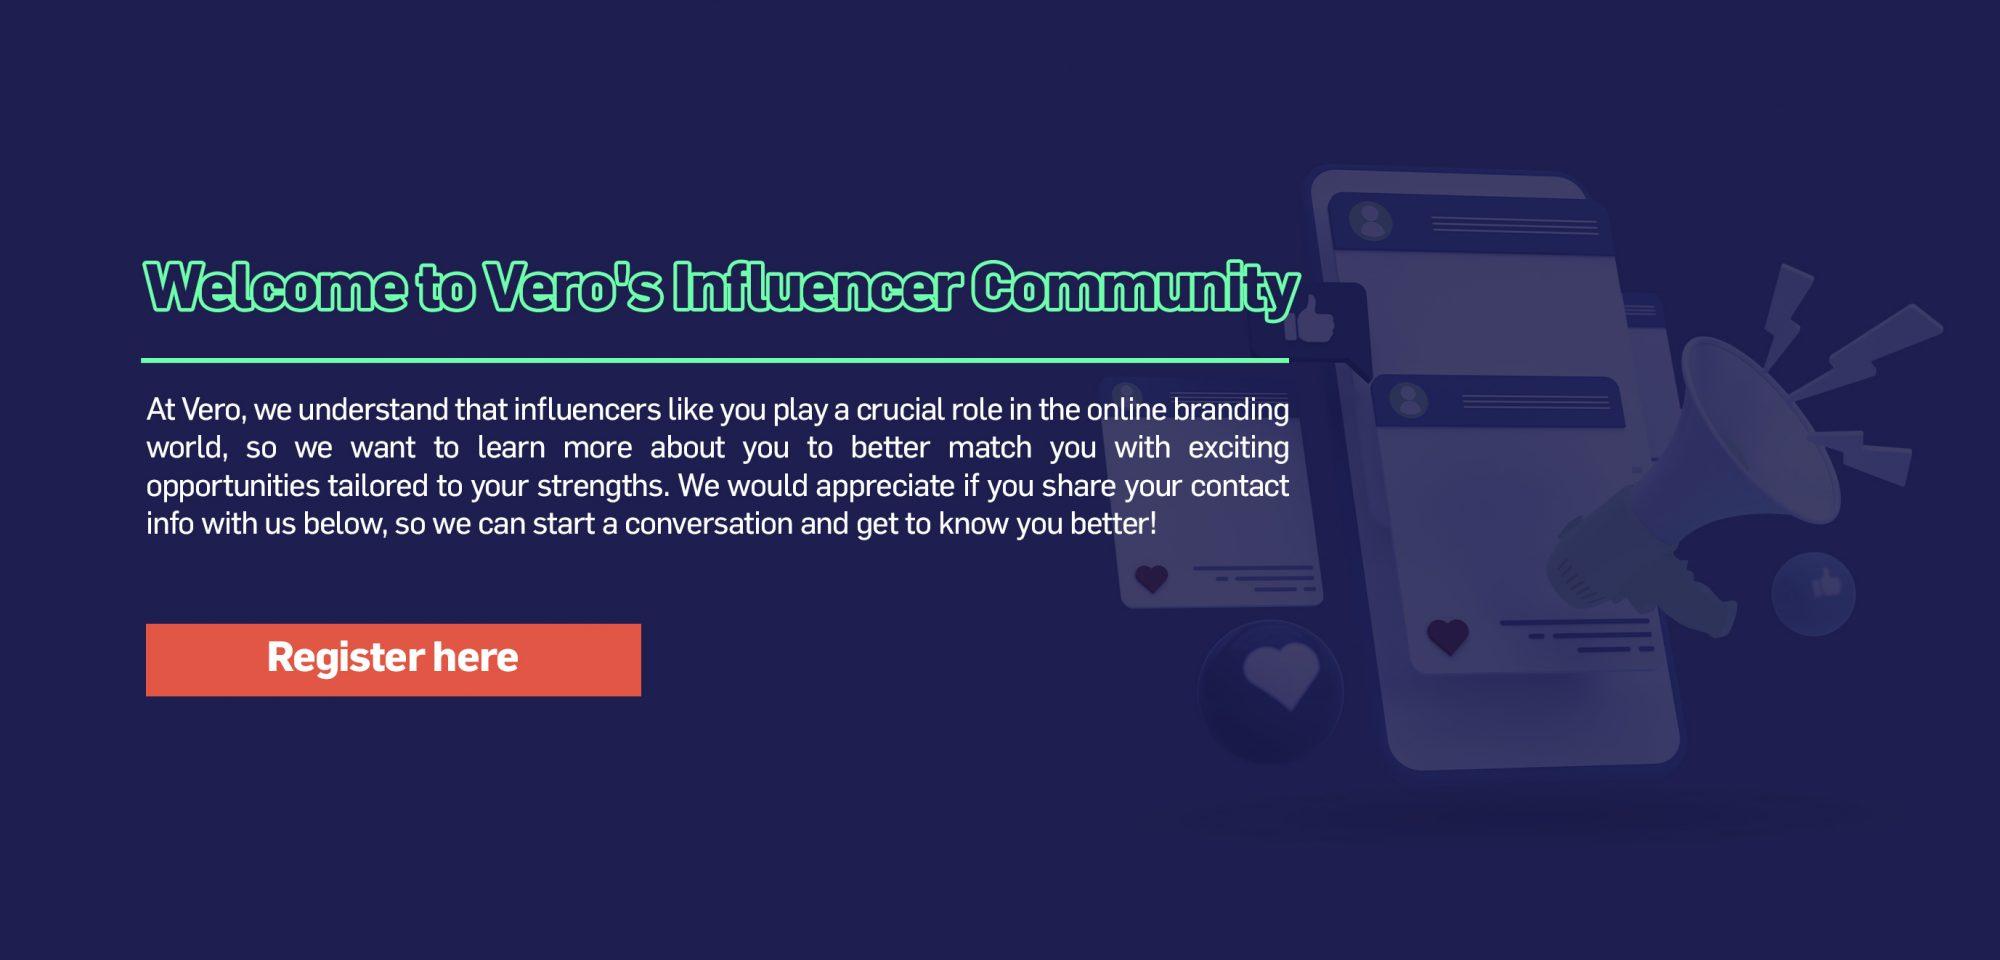 Influencer Community